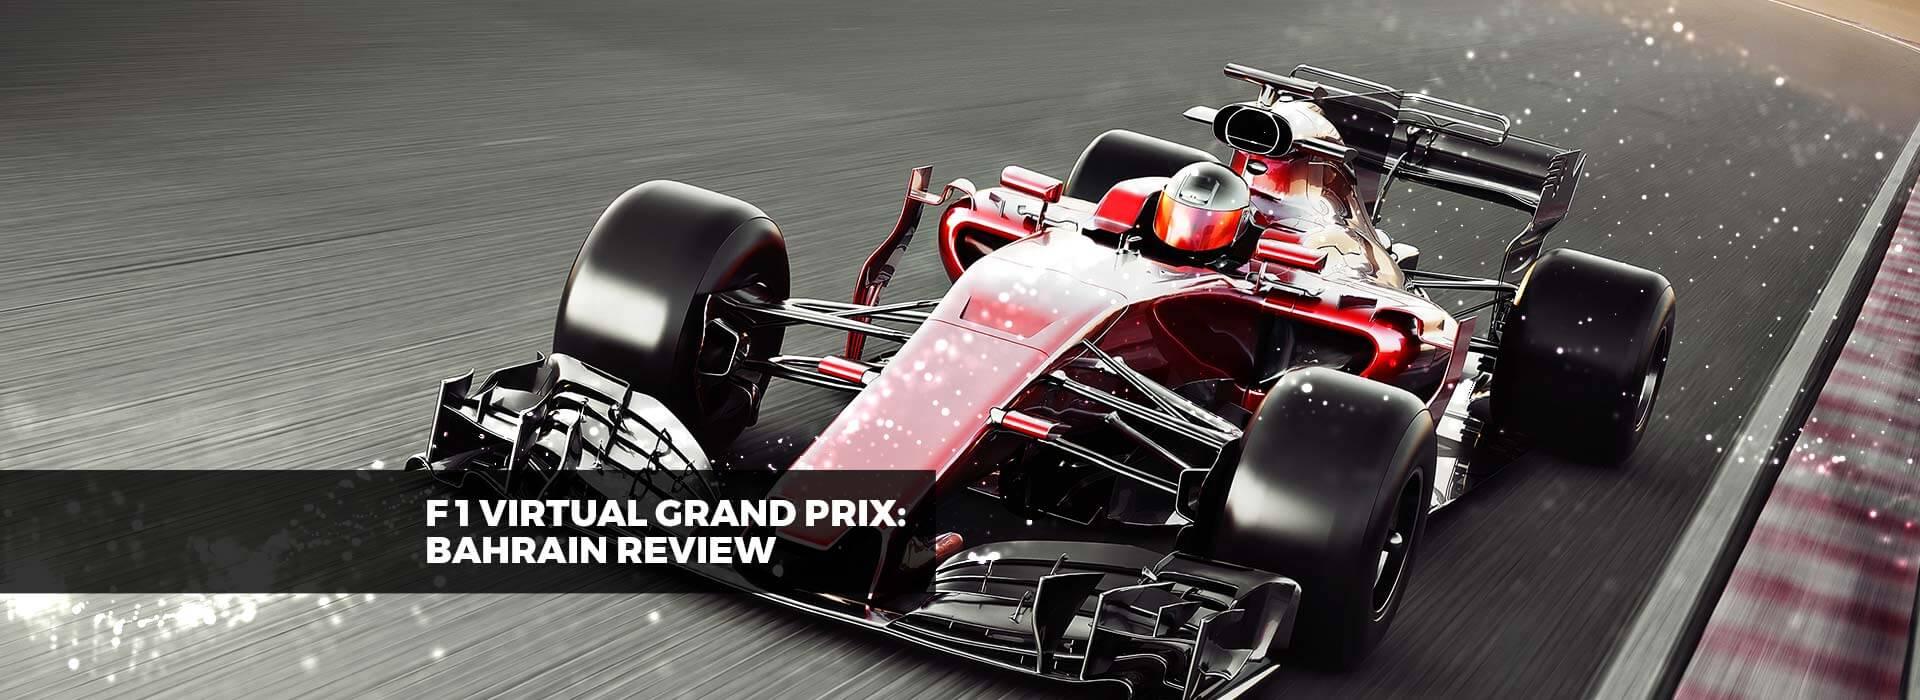 REVIEW: F1 BAHRAIN VIRTUAL GRAND PRIX